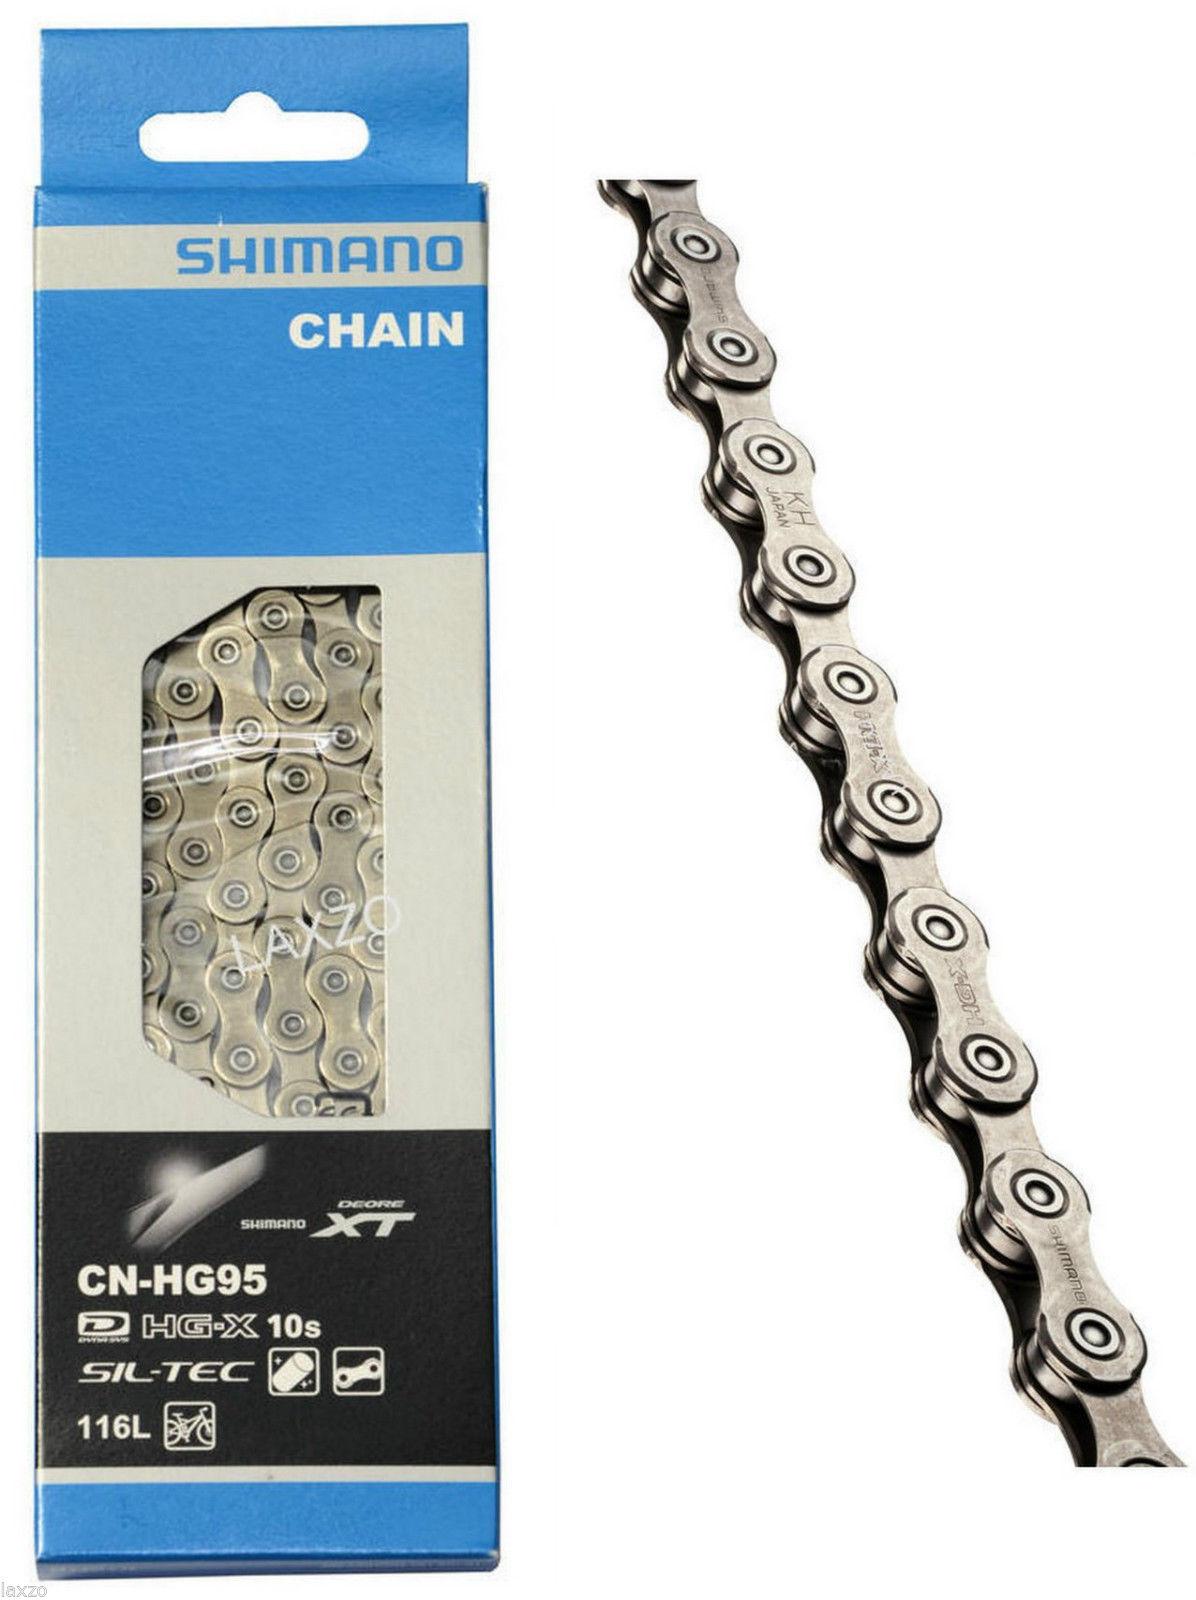 Lant Shimano Deore XT CN-HG95